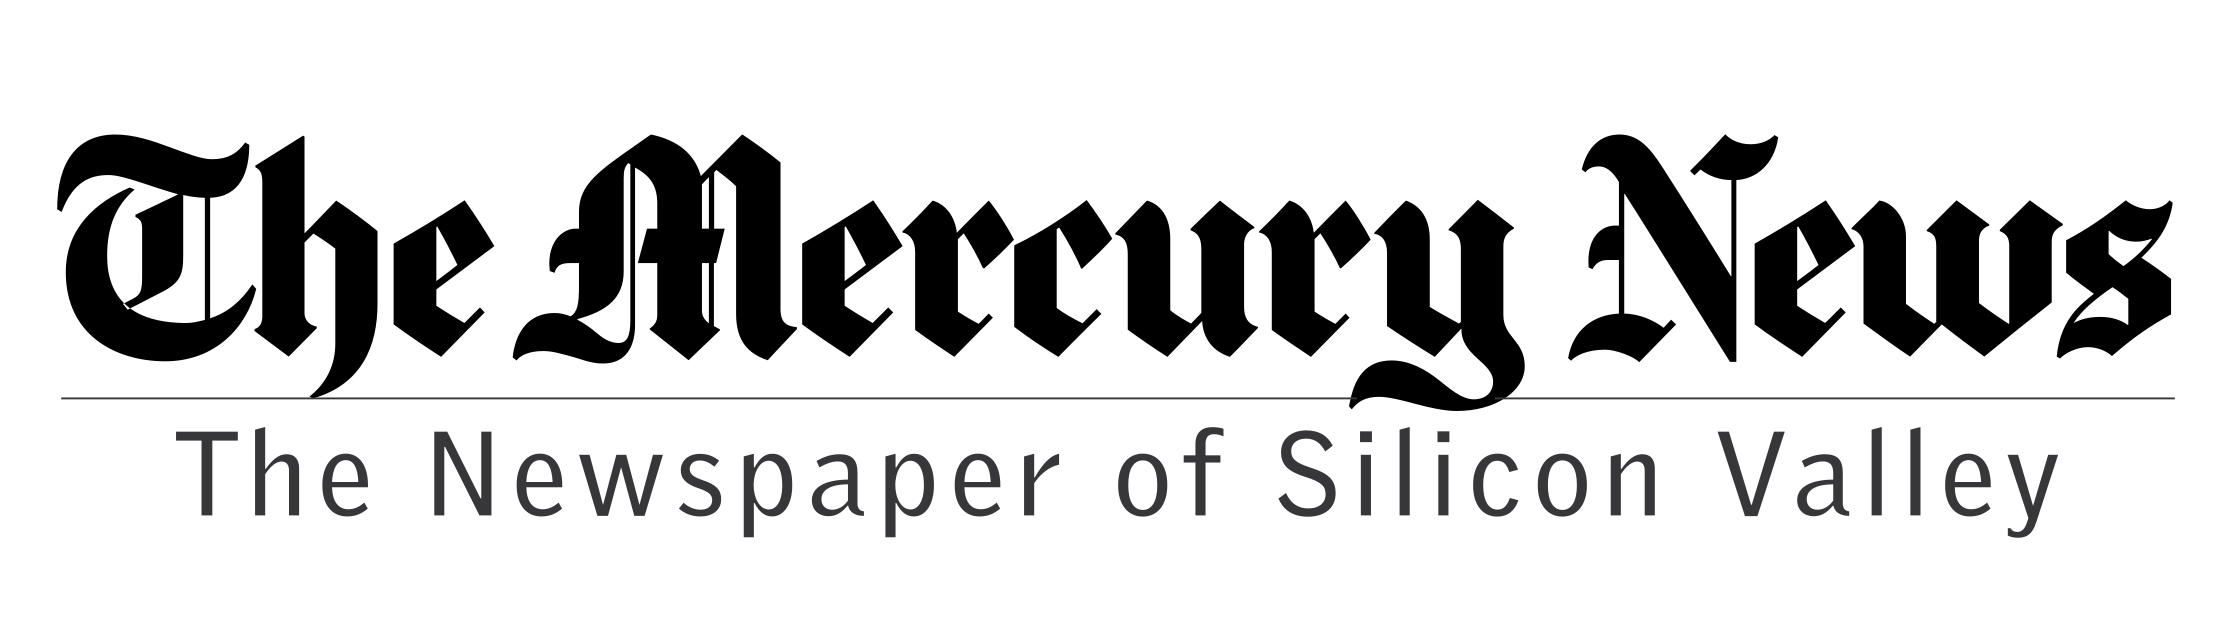 the-mercury-news-logo-png-transparent.png